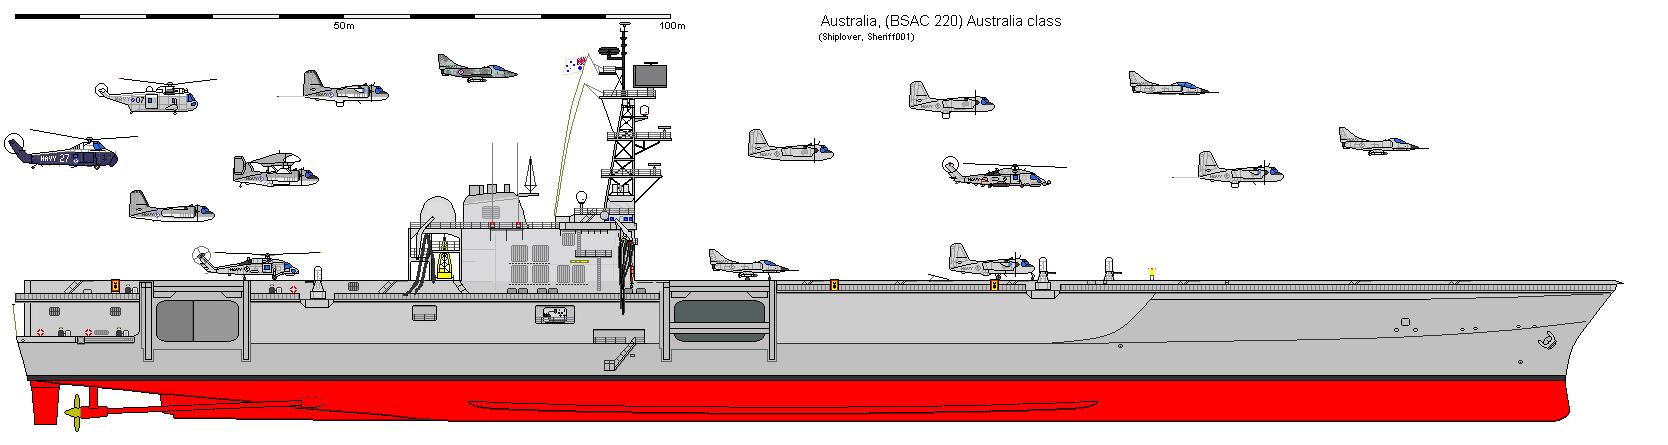 AU CV Australia (BSAC 220).PNG